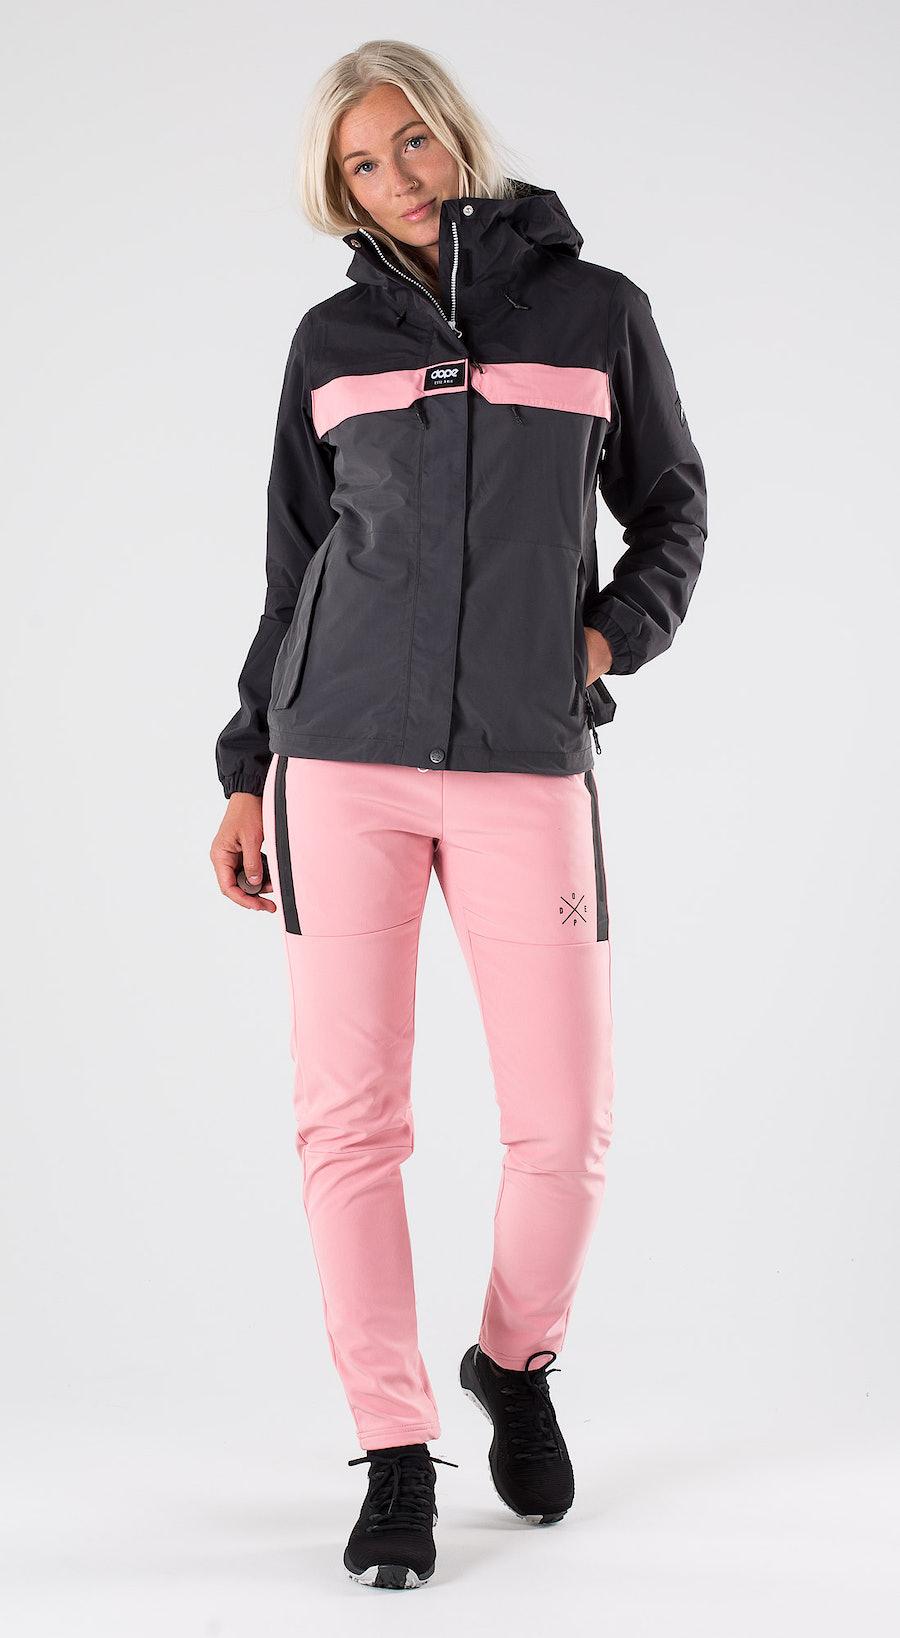 Dope Trekker W Black/Duskgrey/Pink Outfit Multi